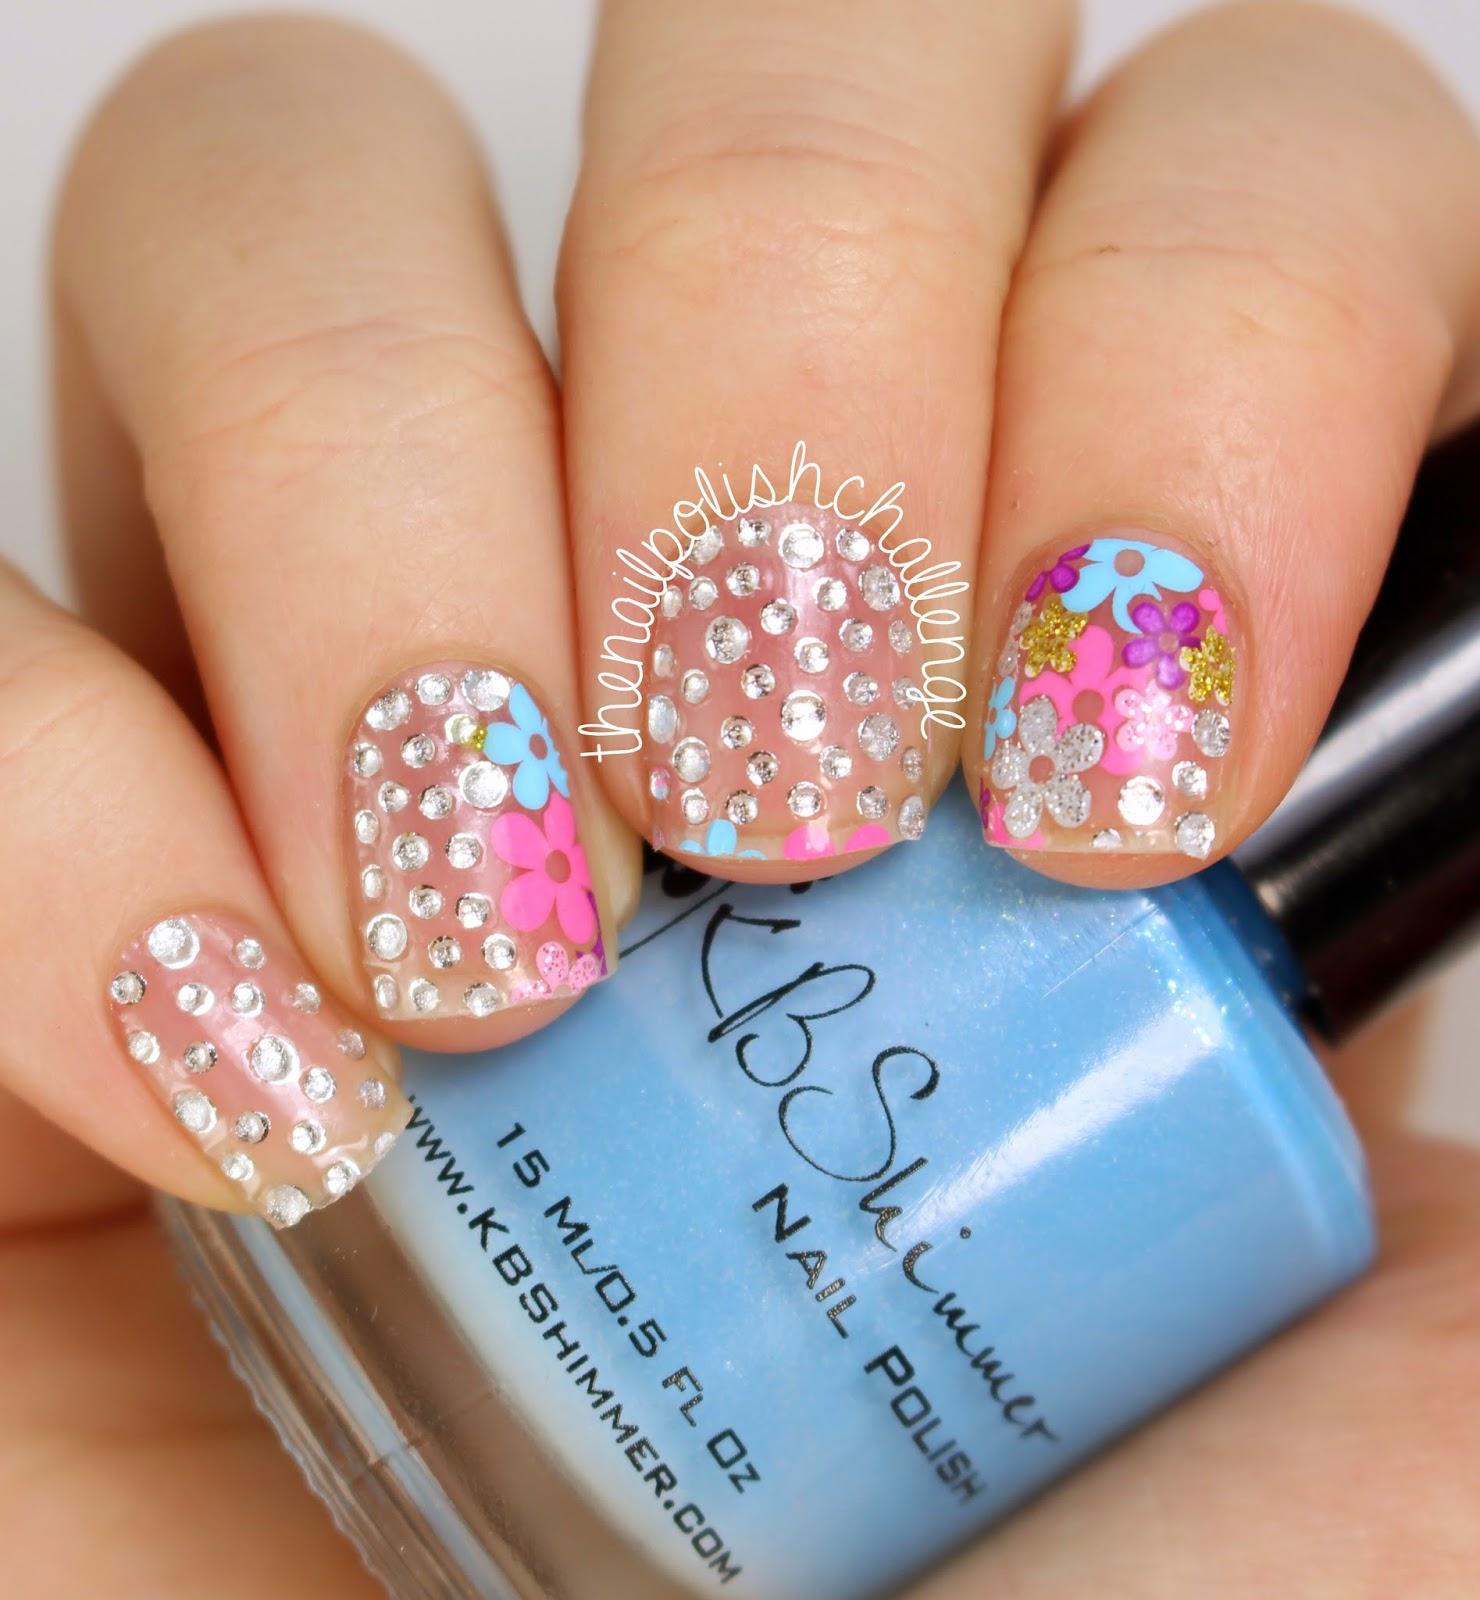 Kelli marissa pueen nail art wraps review pueen nail art wraps review prinsesfo Choice Image